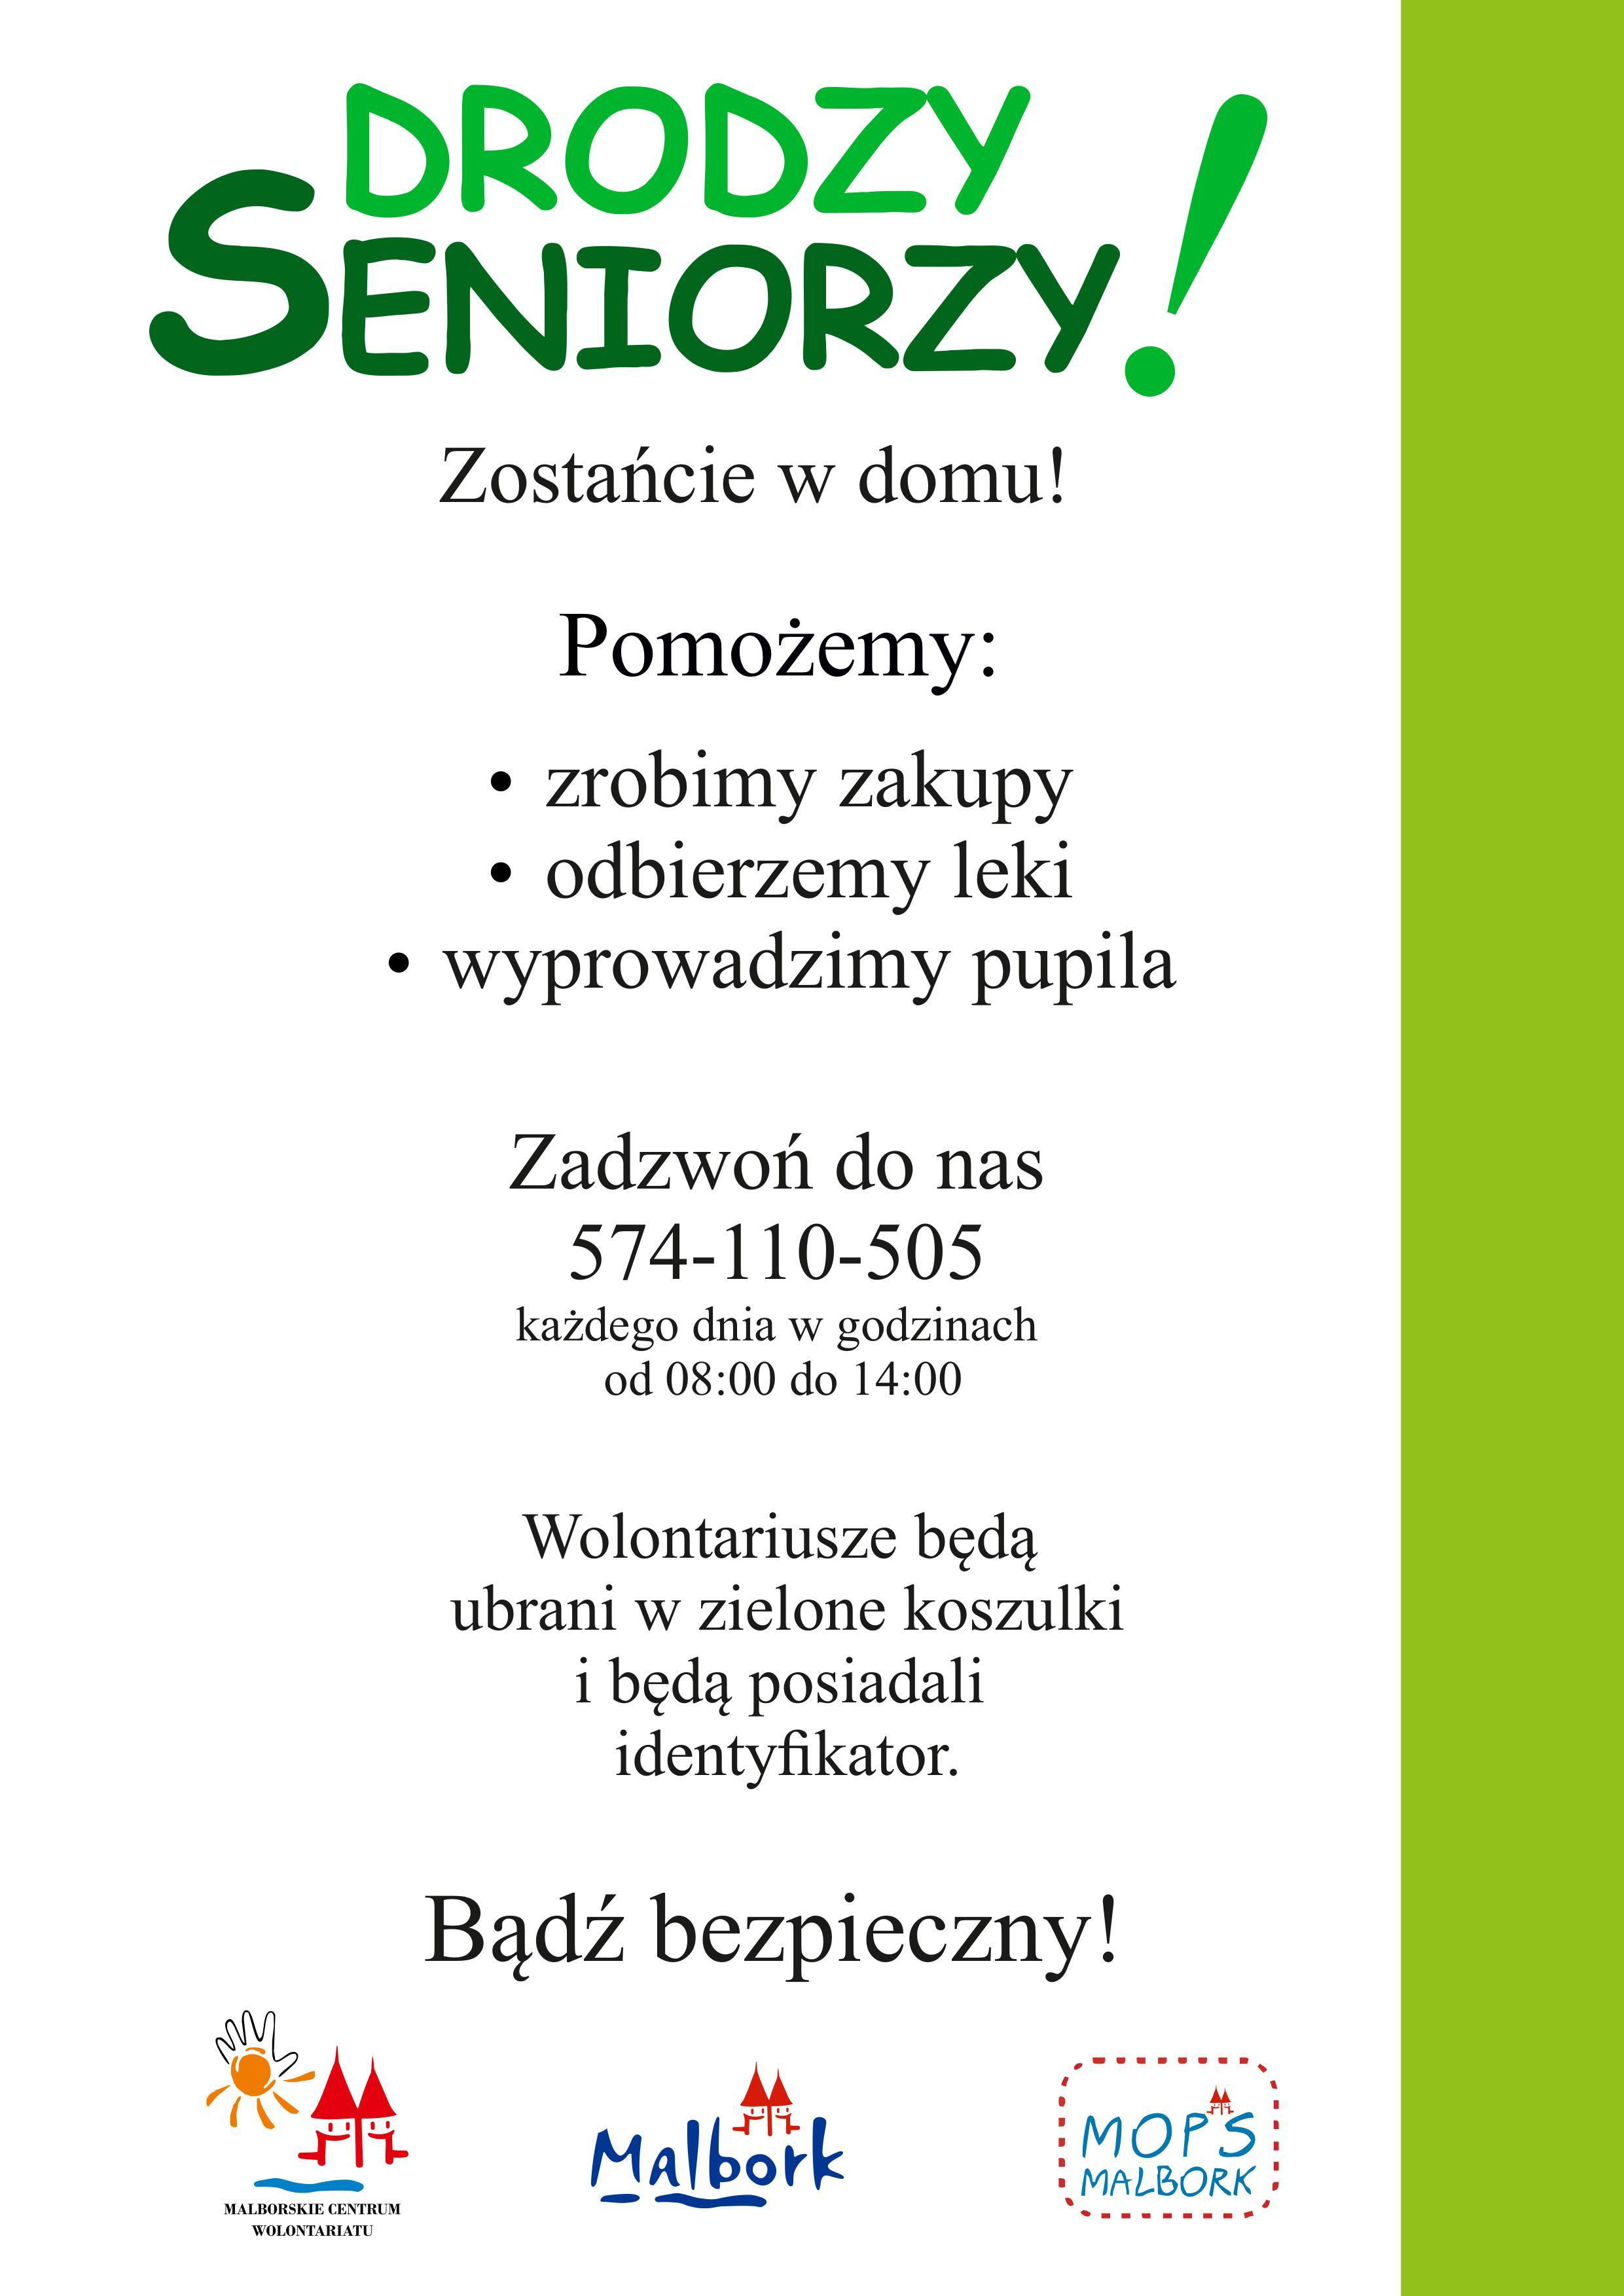 http://m.82-200.pl/2020/03/orig/plakat-mcw-5648.jpg